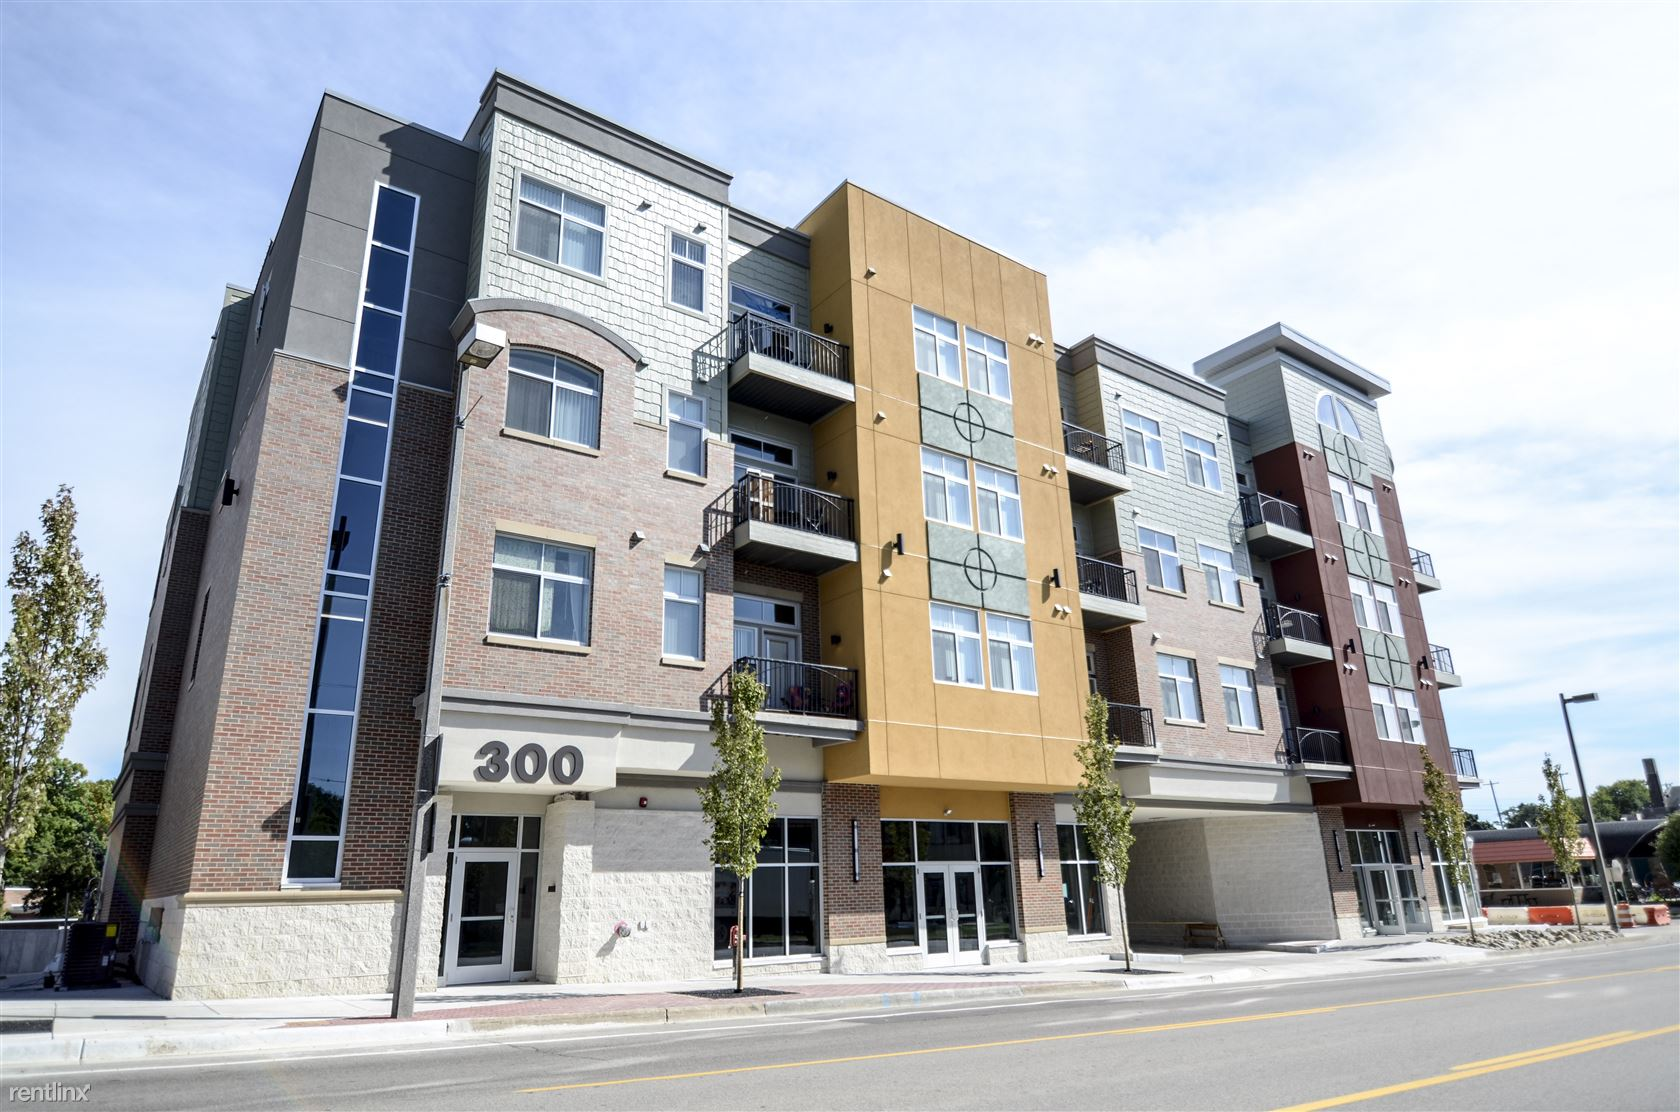 East lansing apartments for rent east lansing rental - 3 bedroom apartments east lansing mi ...